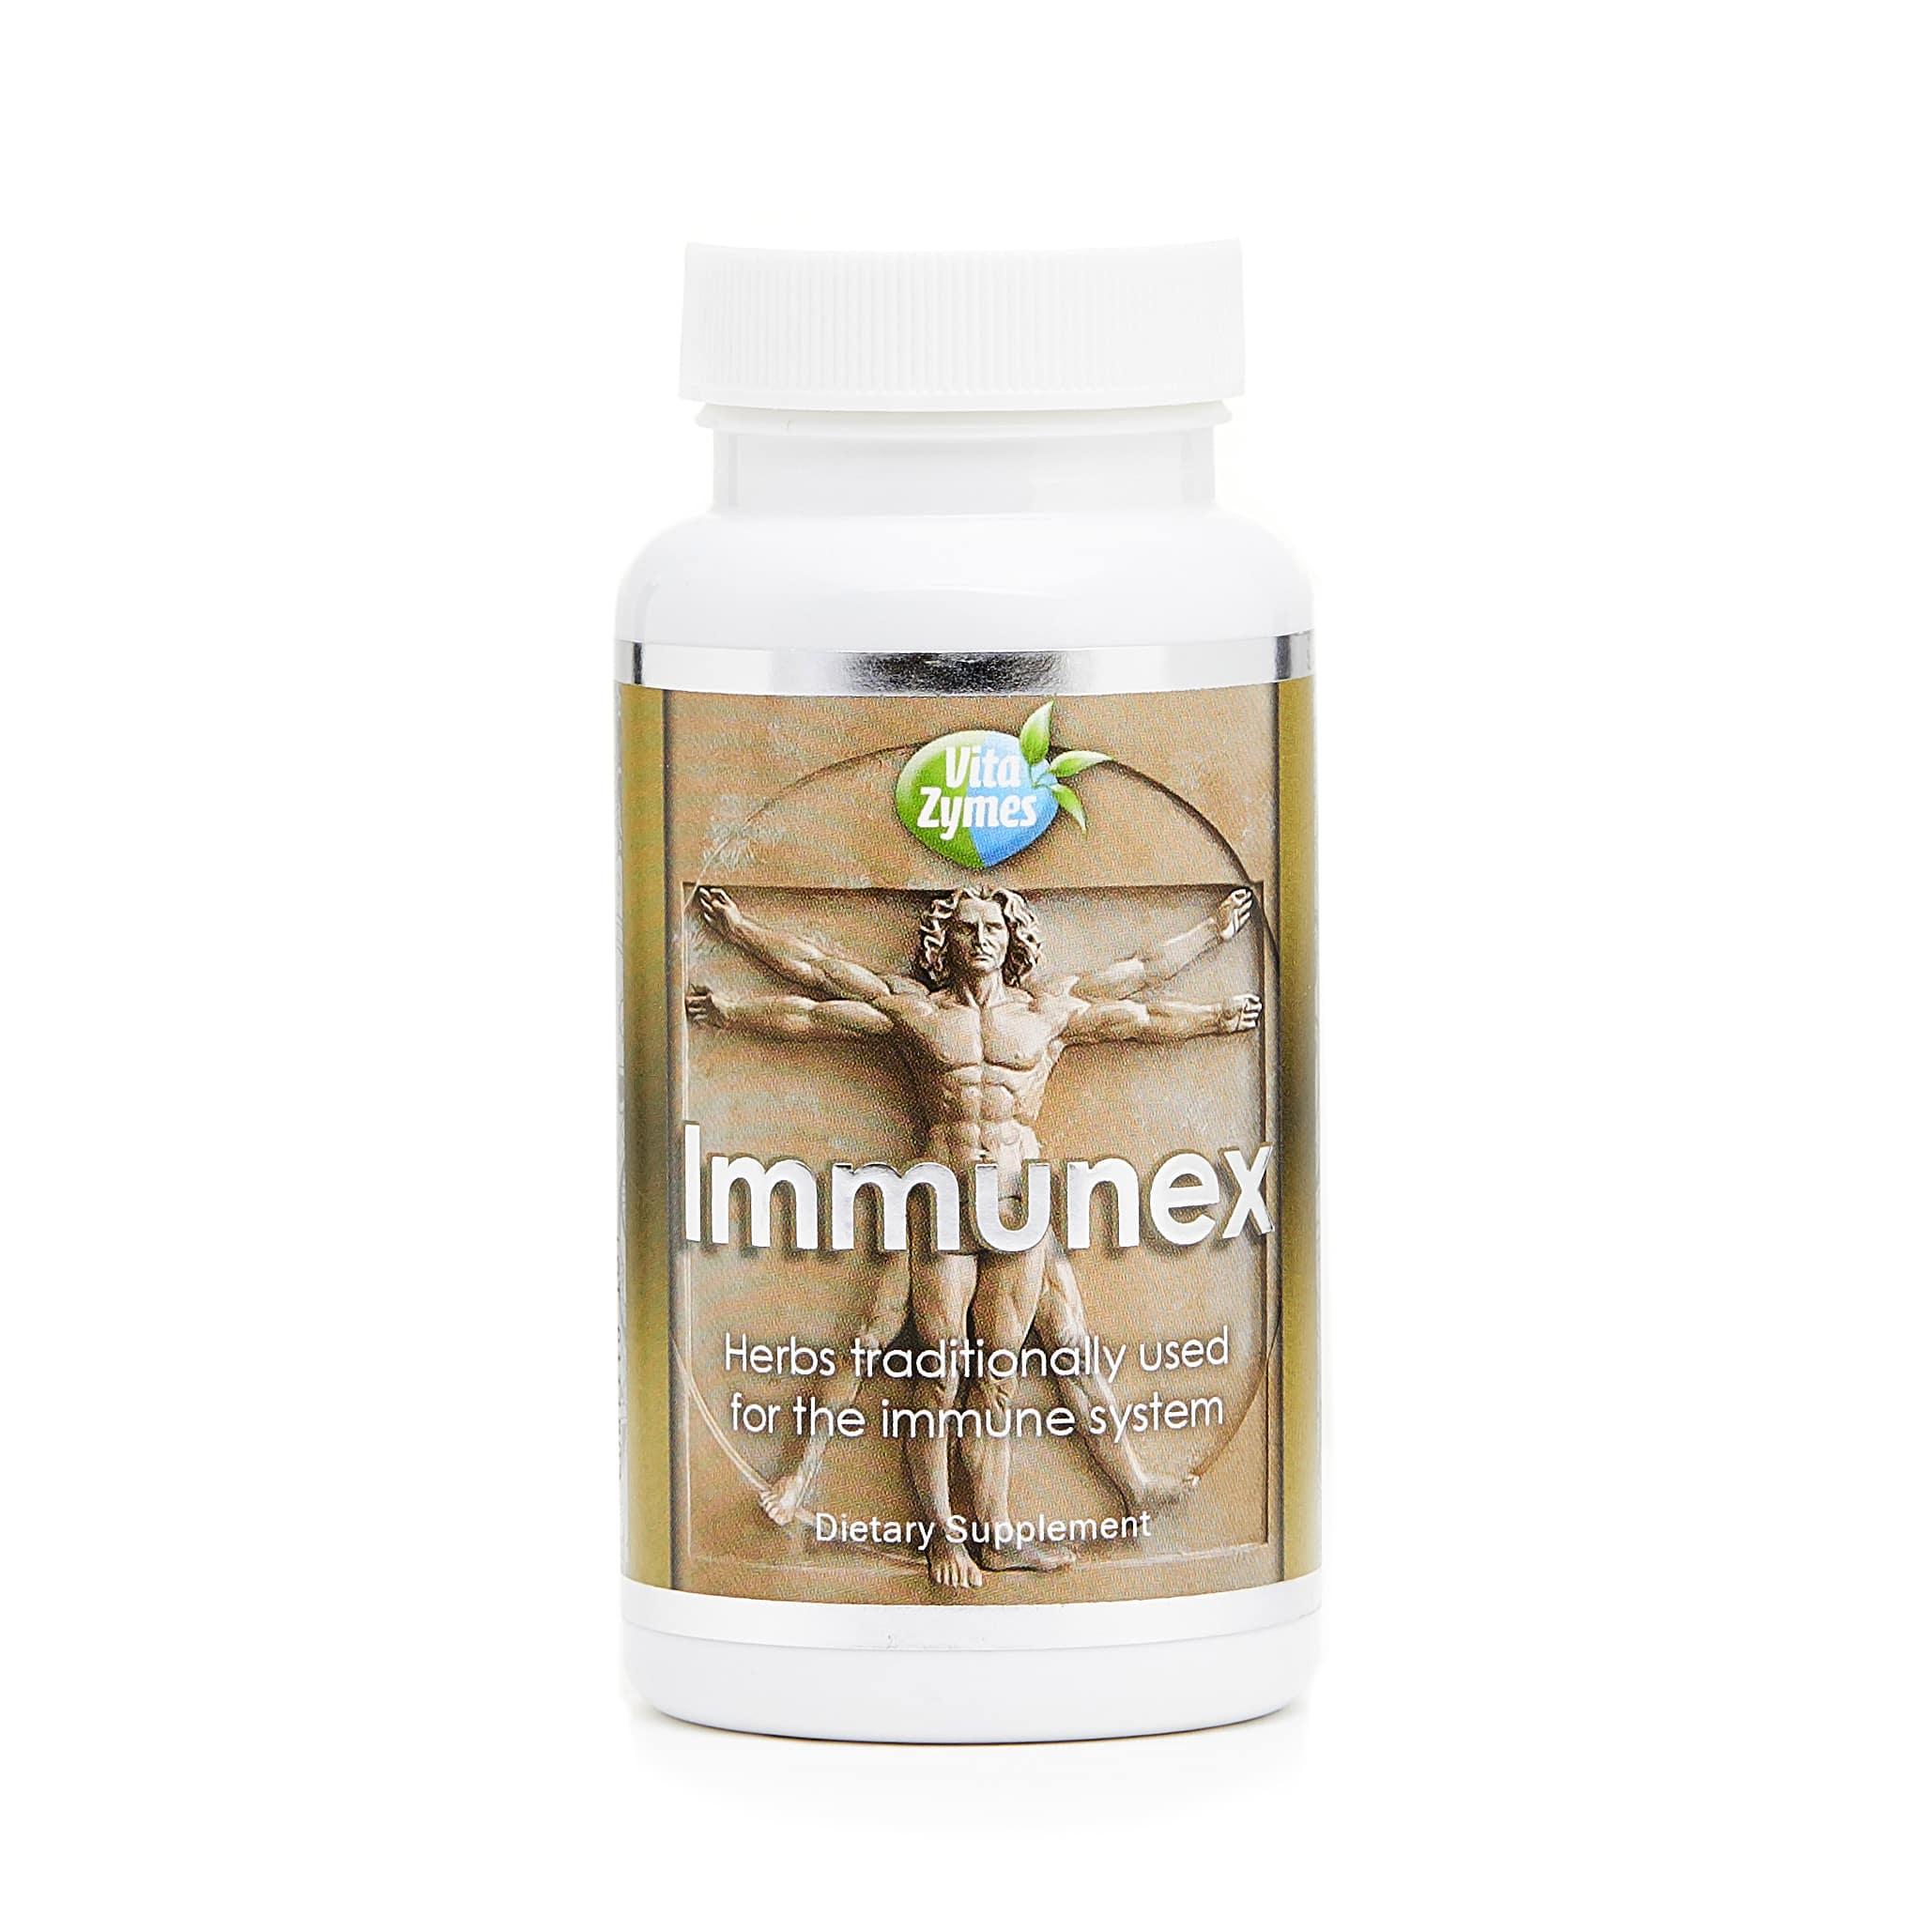 vitazymes-immunex.